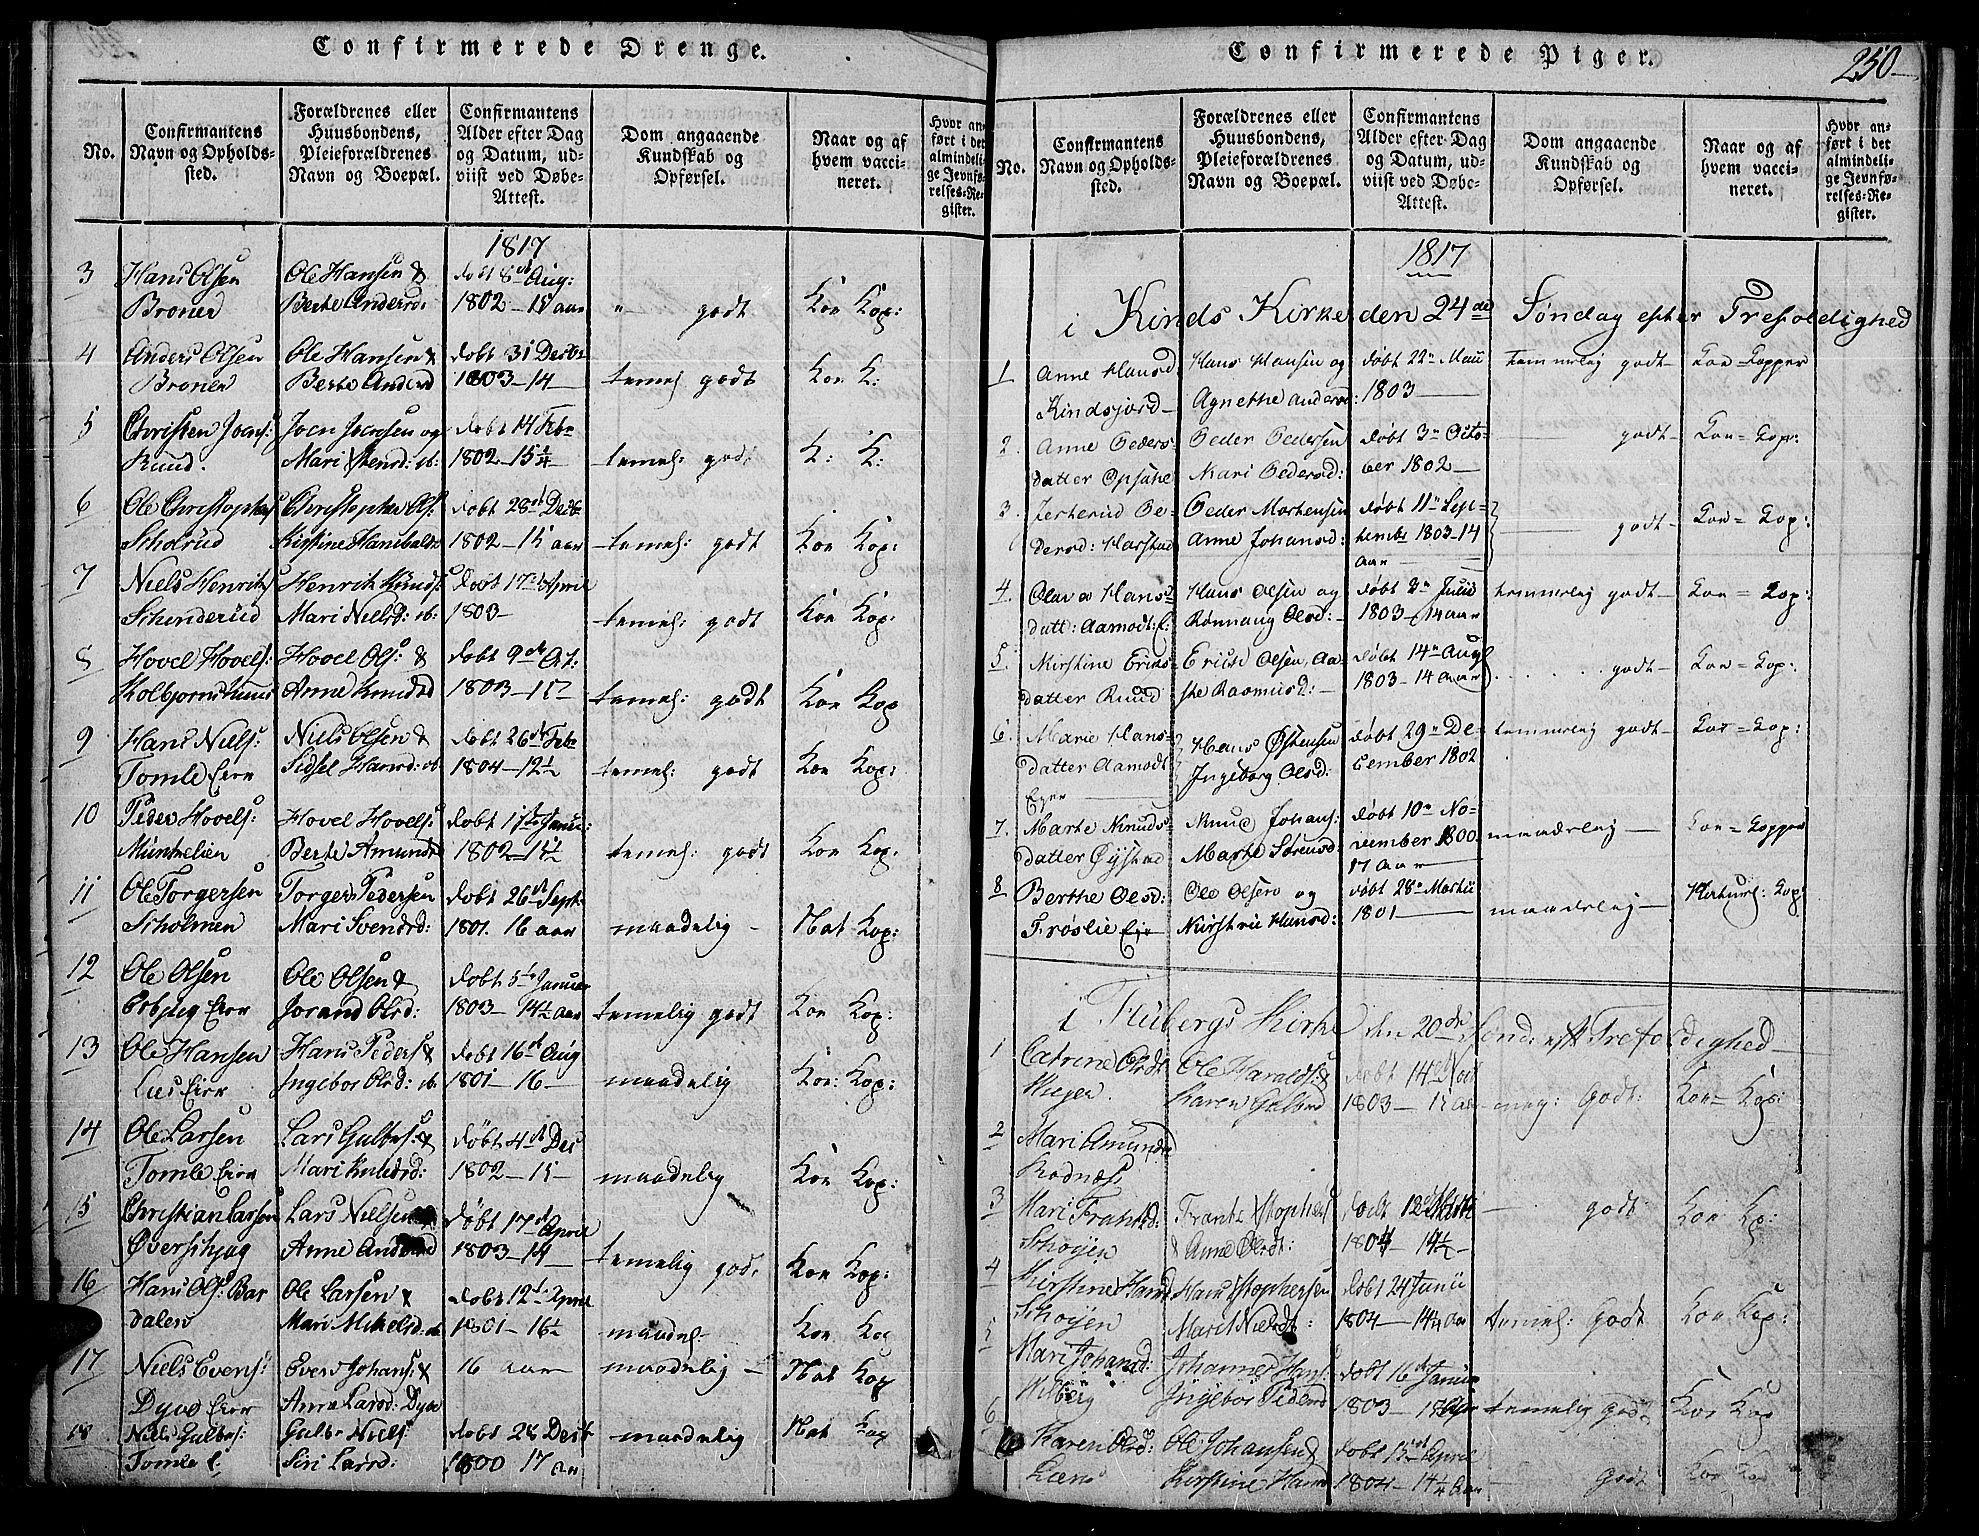 SAH, Land prestekontor, Ministerialbok nr. 7, 1814-1830, s. 250b